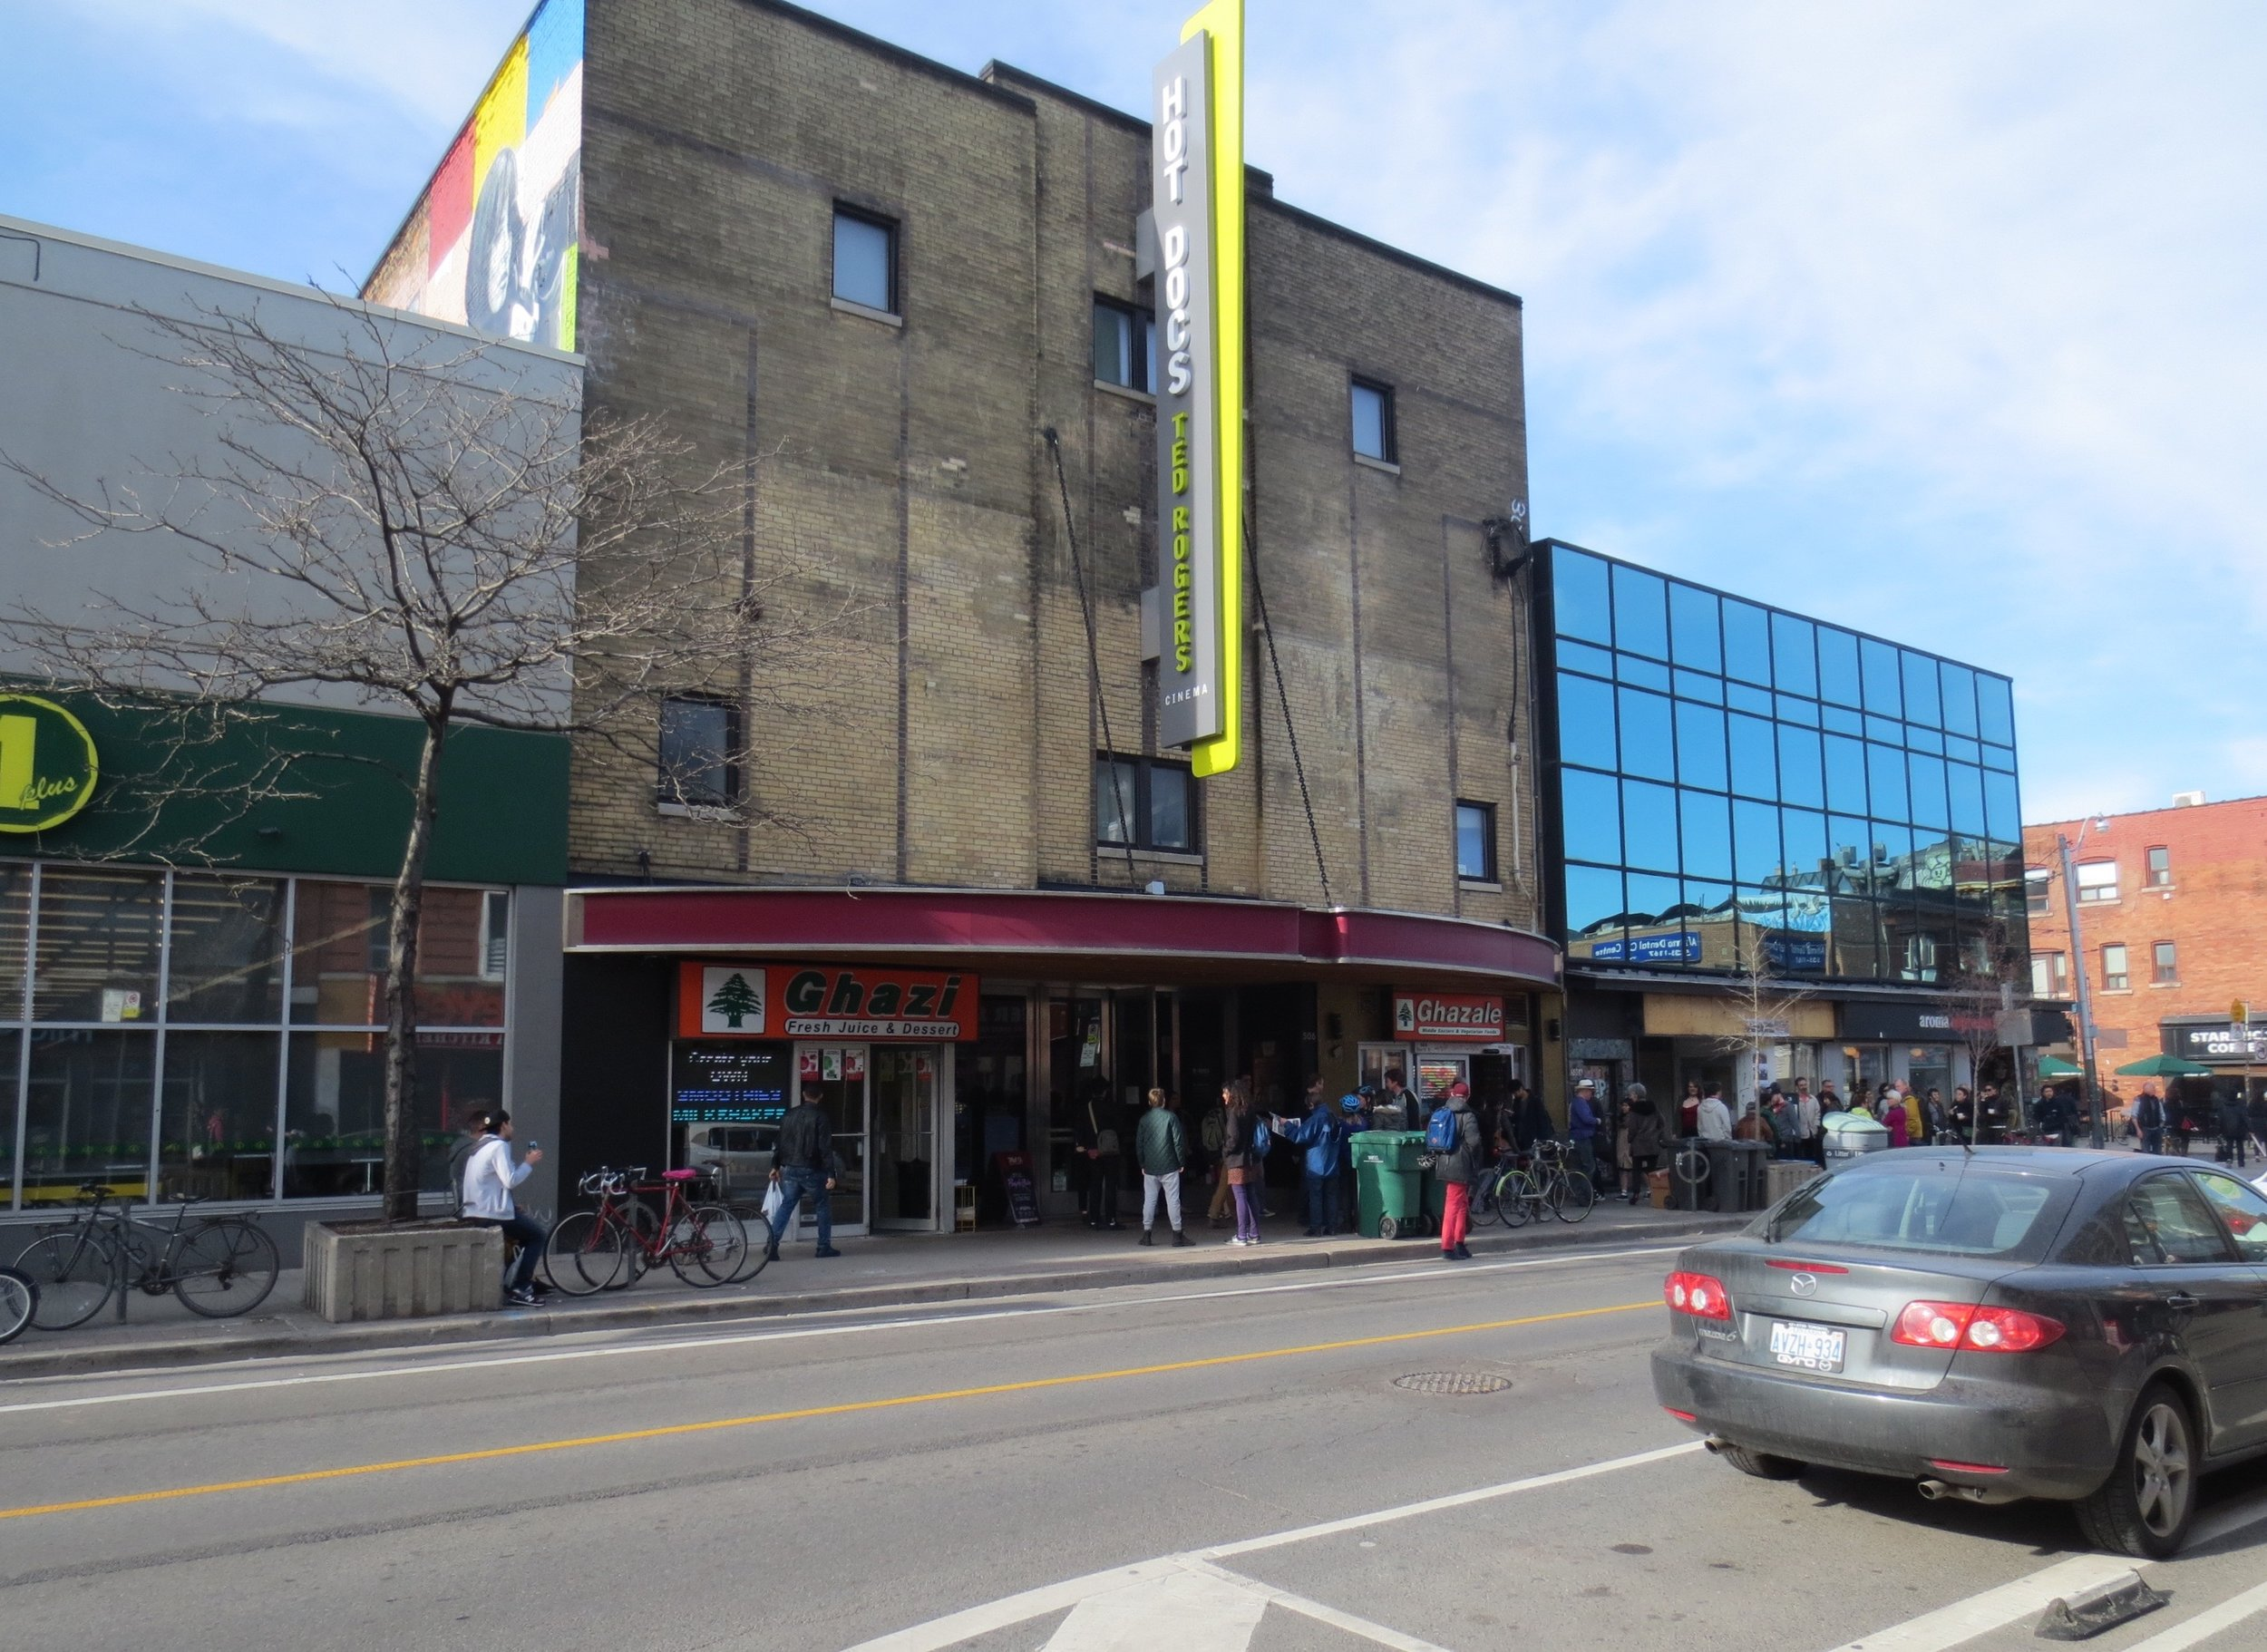 hot docs cinema exterior